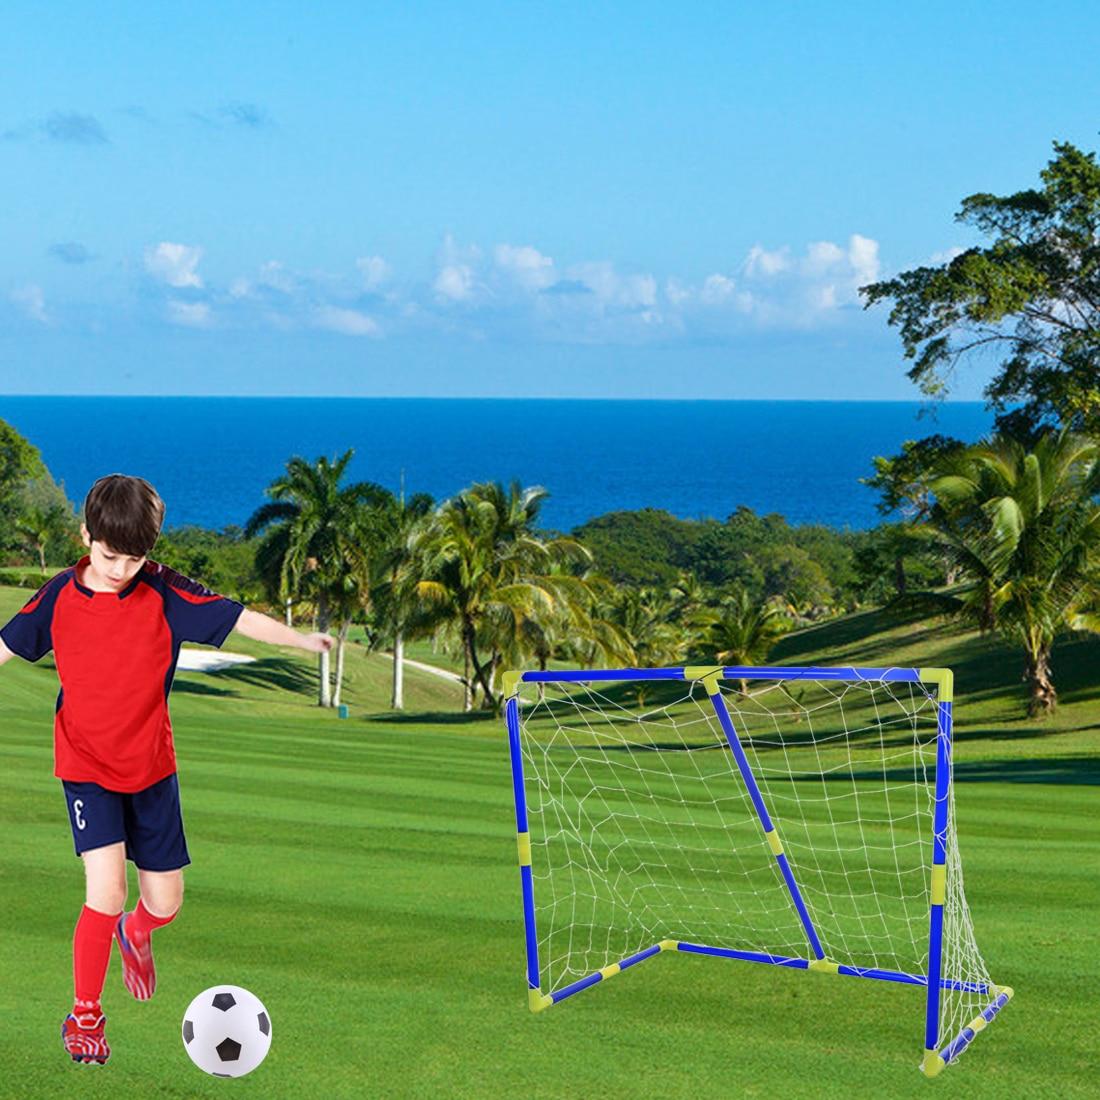 Surwish 2018 New Portable Detachable Kids Football Goal Soccer Door Set For Children Sports